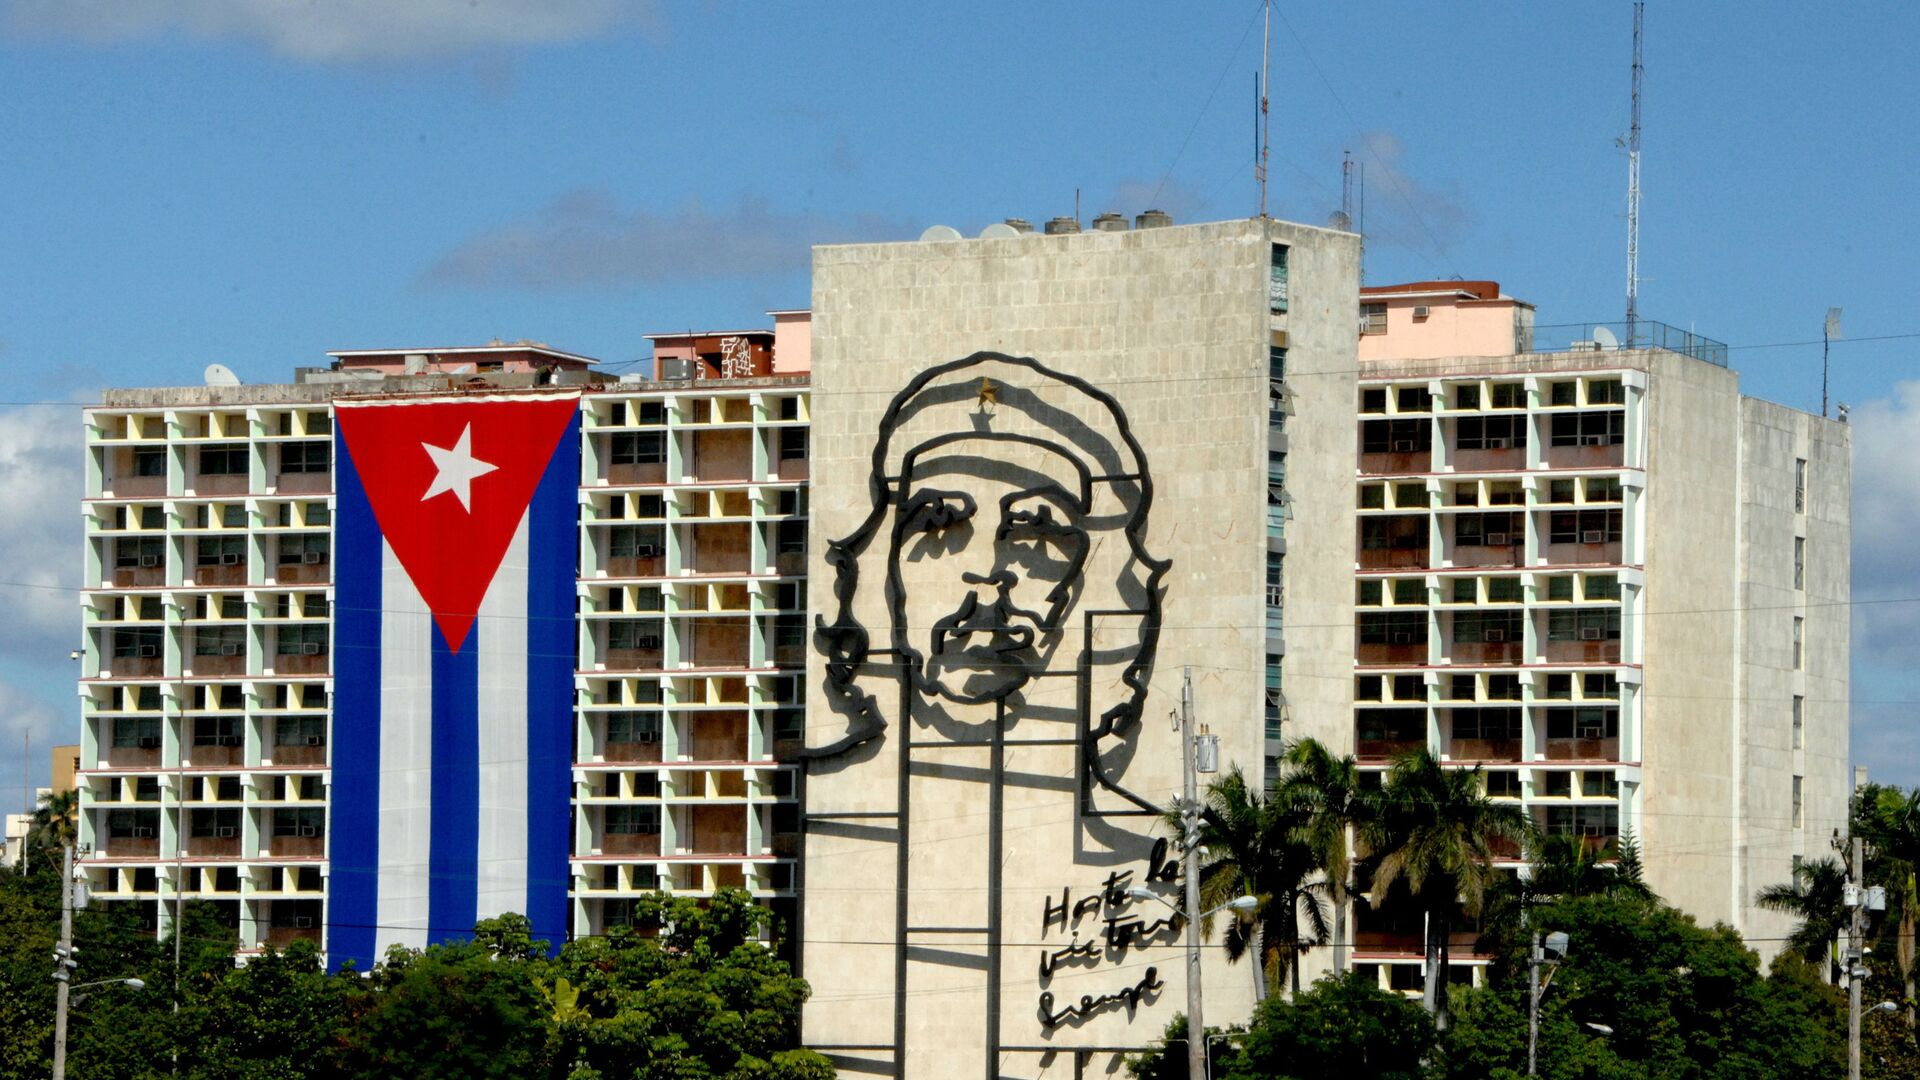 Bandera cubana en La Habana, capital de Cuba - Sputnik Mundo, 1920, 22.06.2021